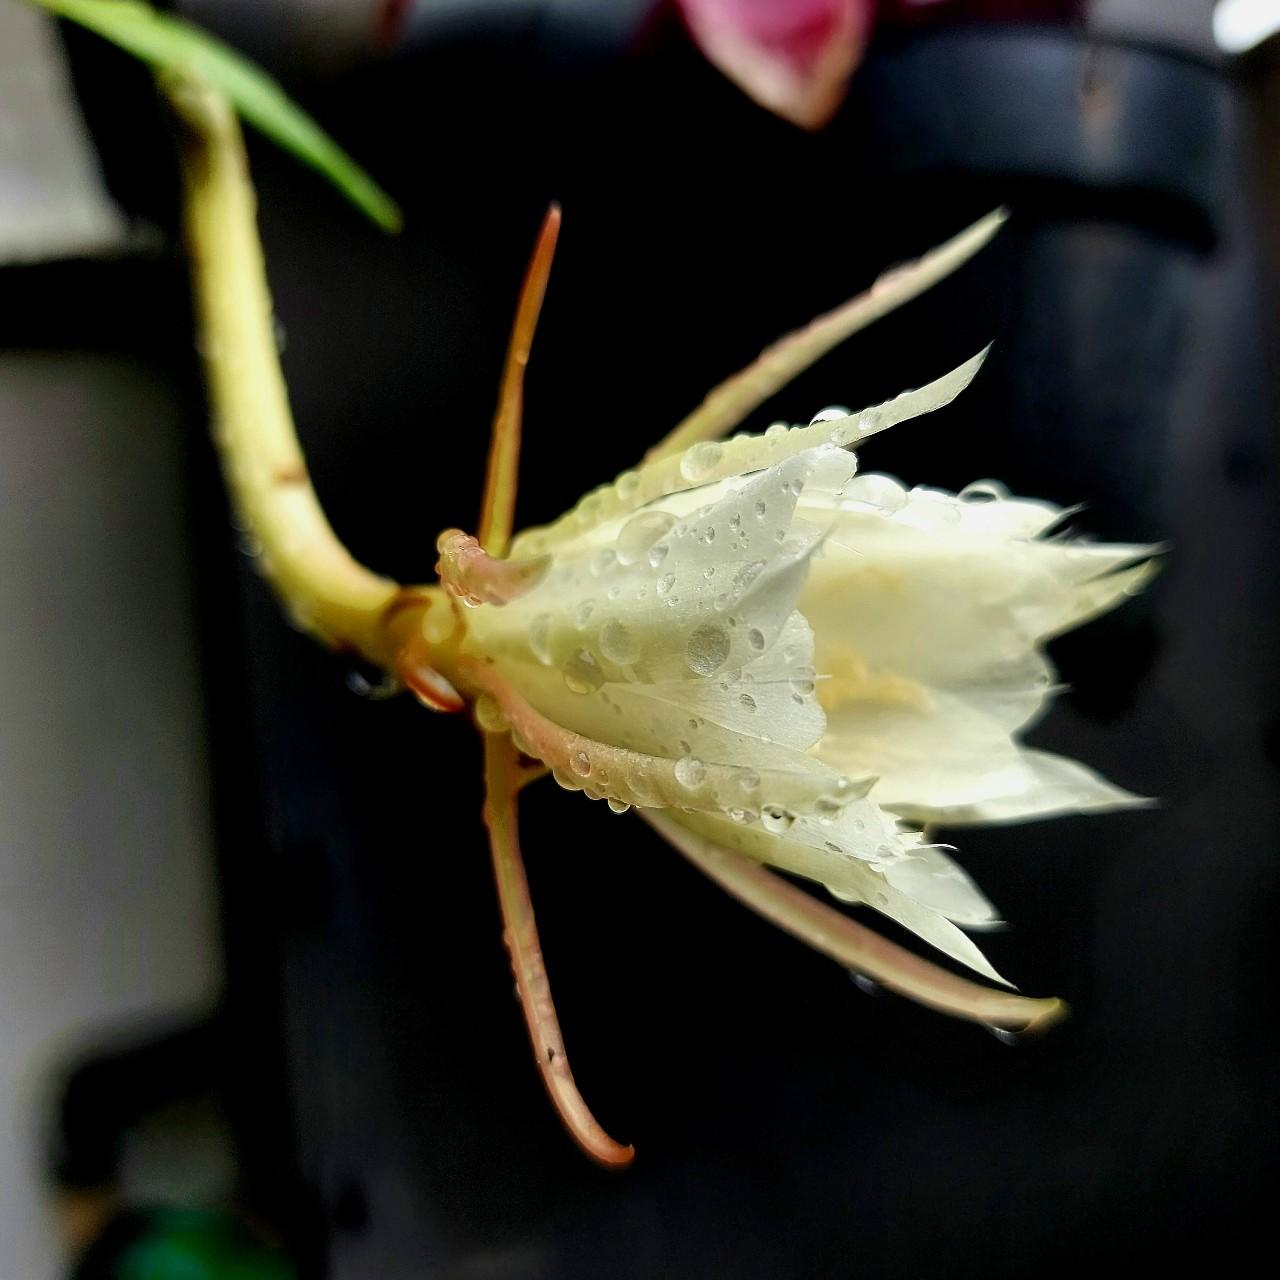 Bunga wijayakusuma belum mekar penuh sudah diguyur hujan